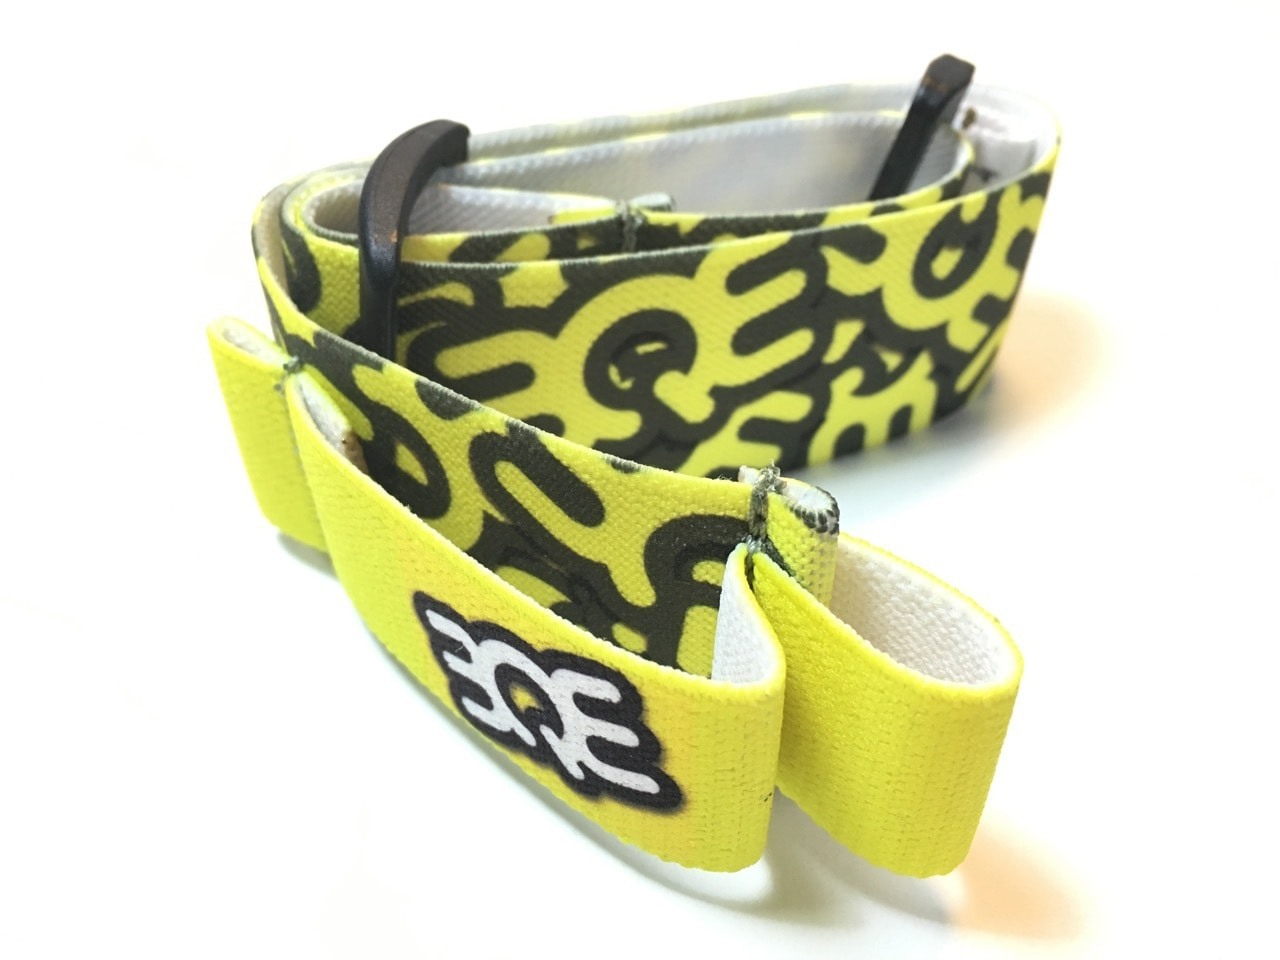 aacb7931bc3 BQE Goggle Strap by Hotdog FPV - BQE.io